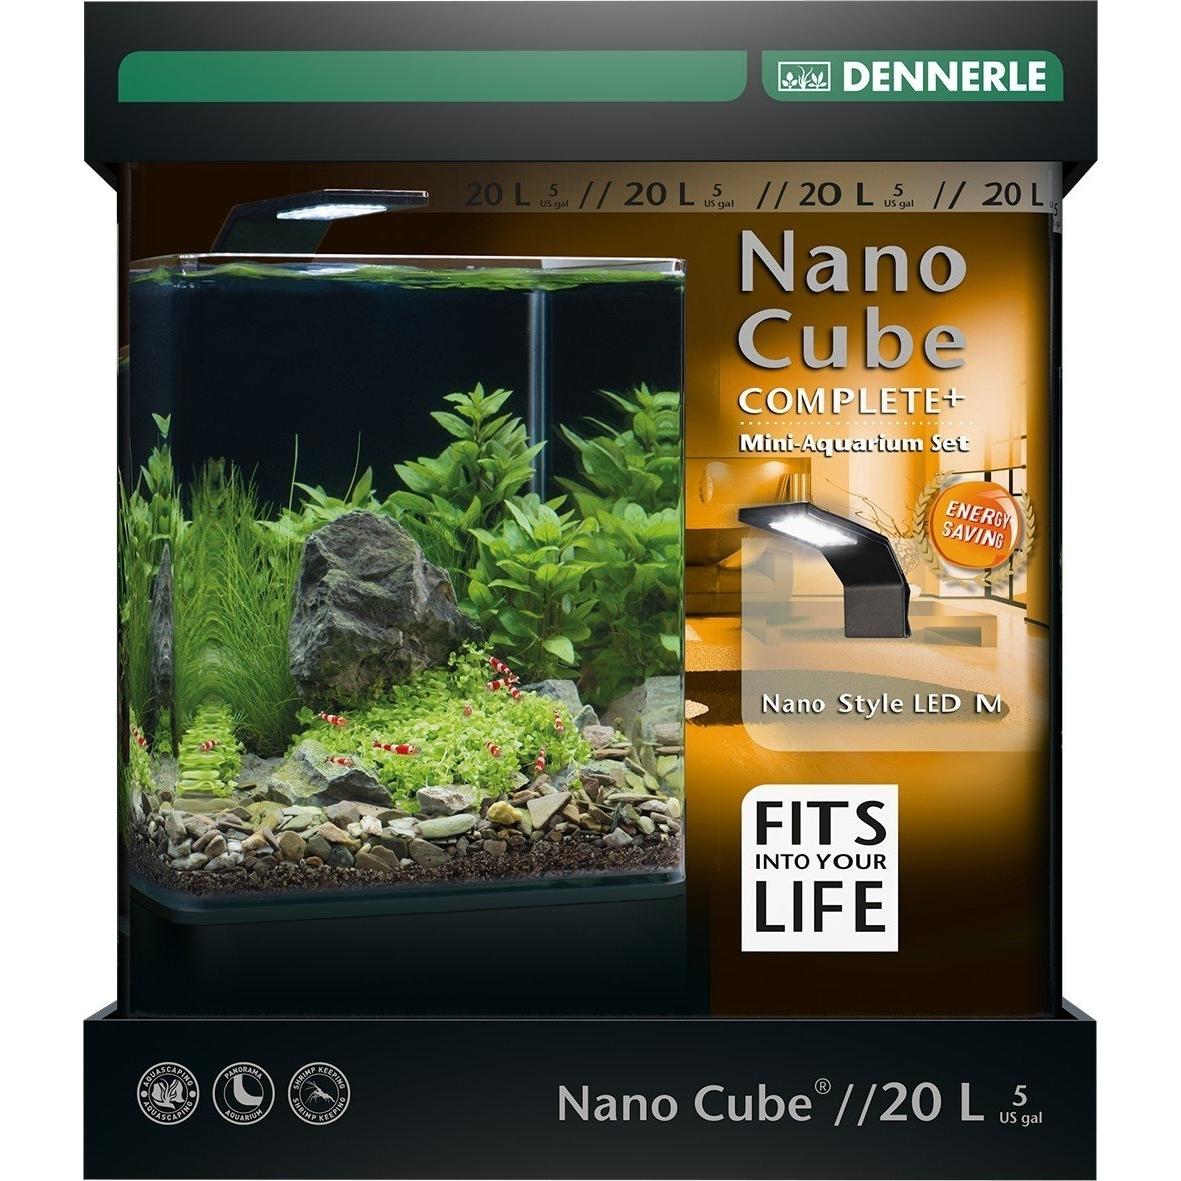 Dennerle NanoCube Complete+ Style LED Bild 6